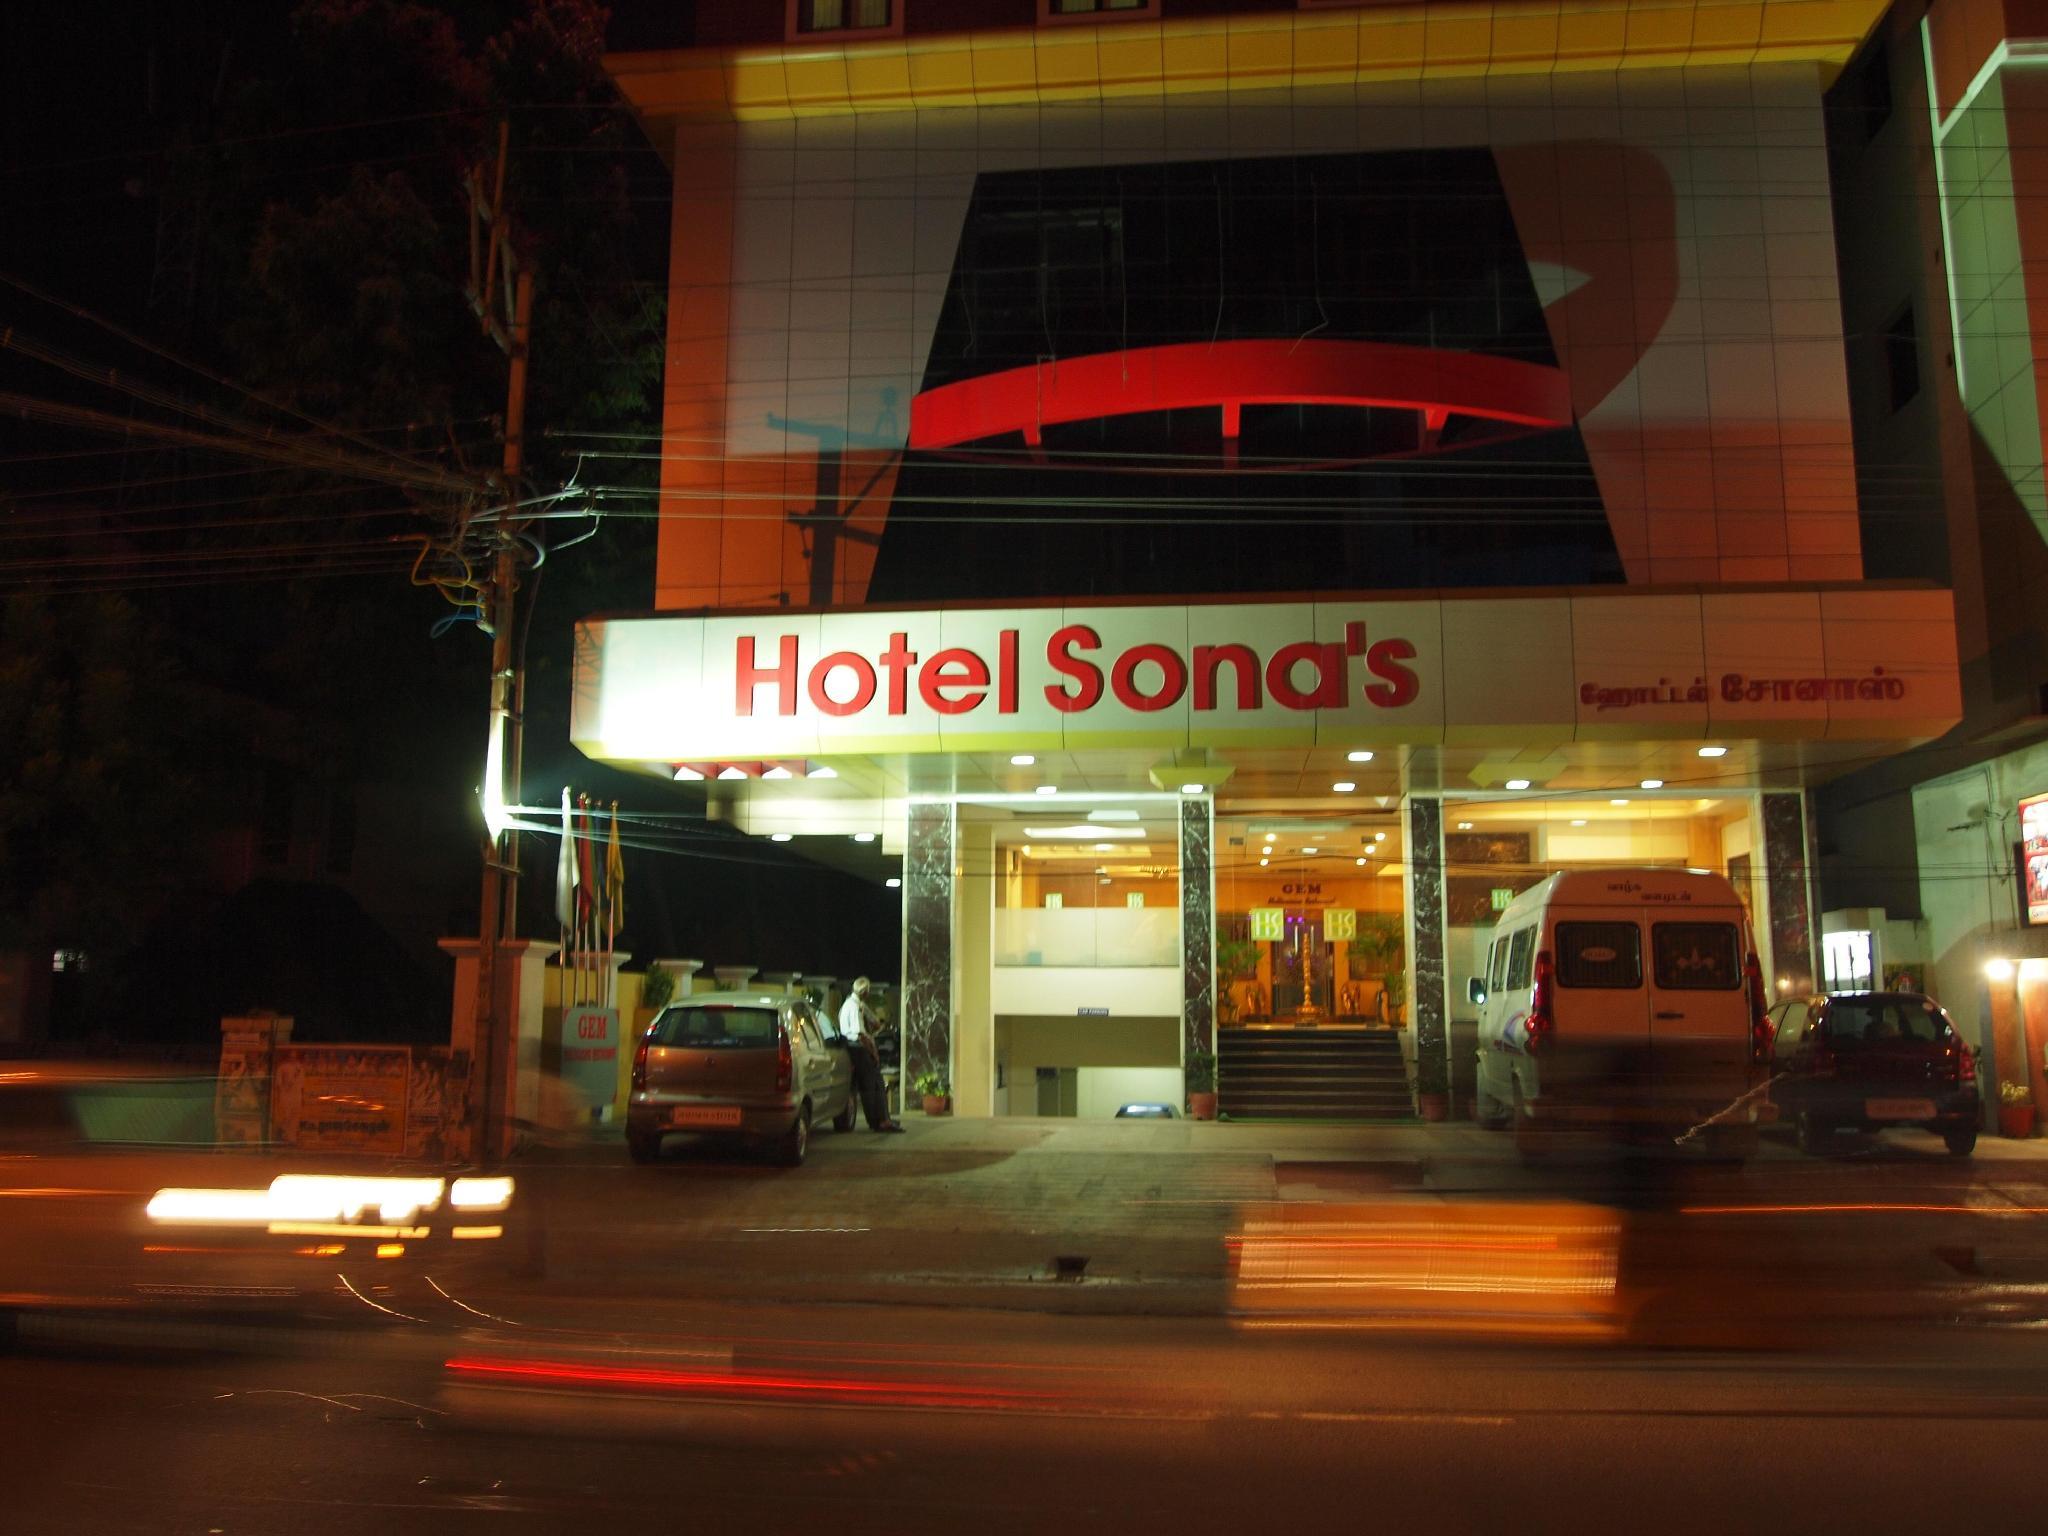 Hotel Sonas